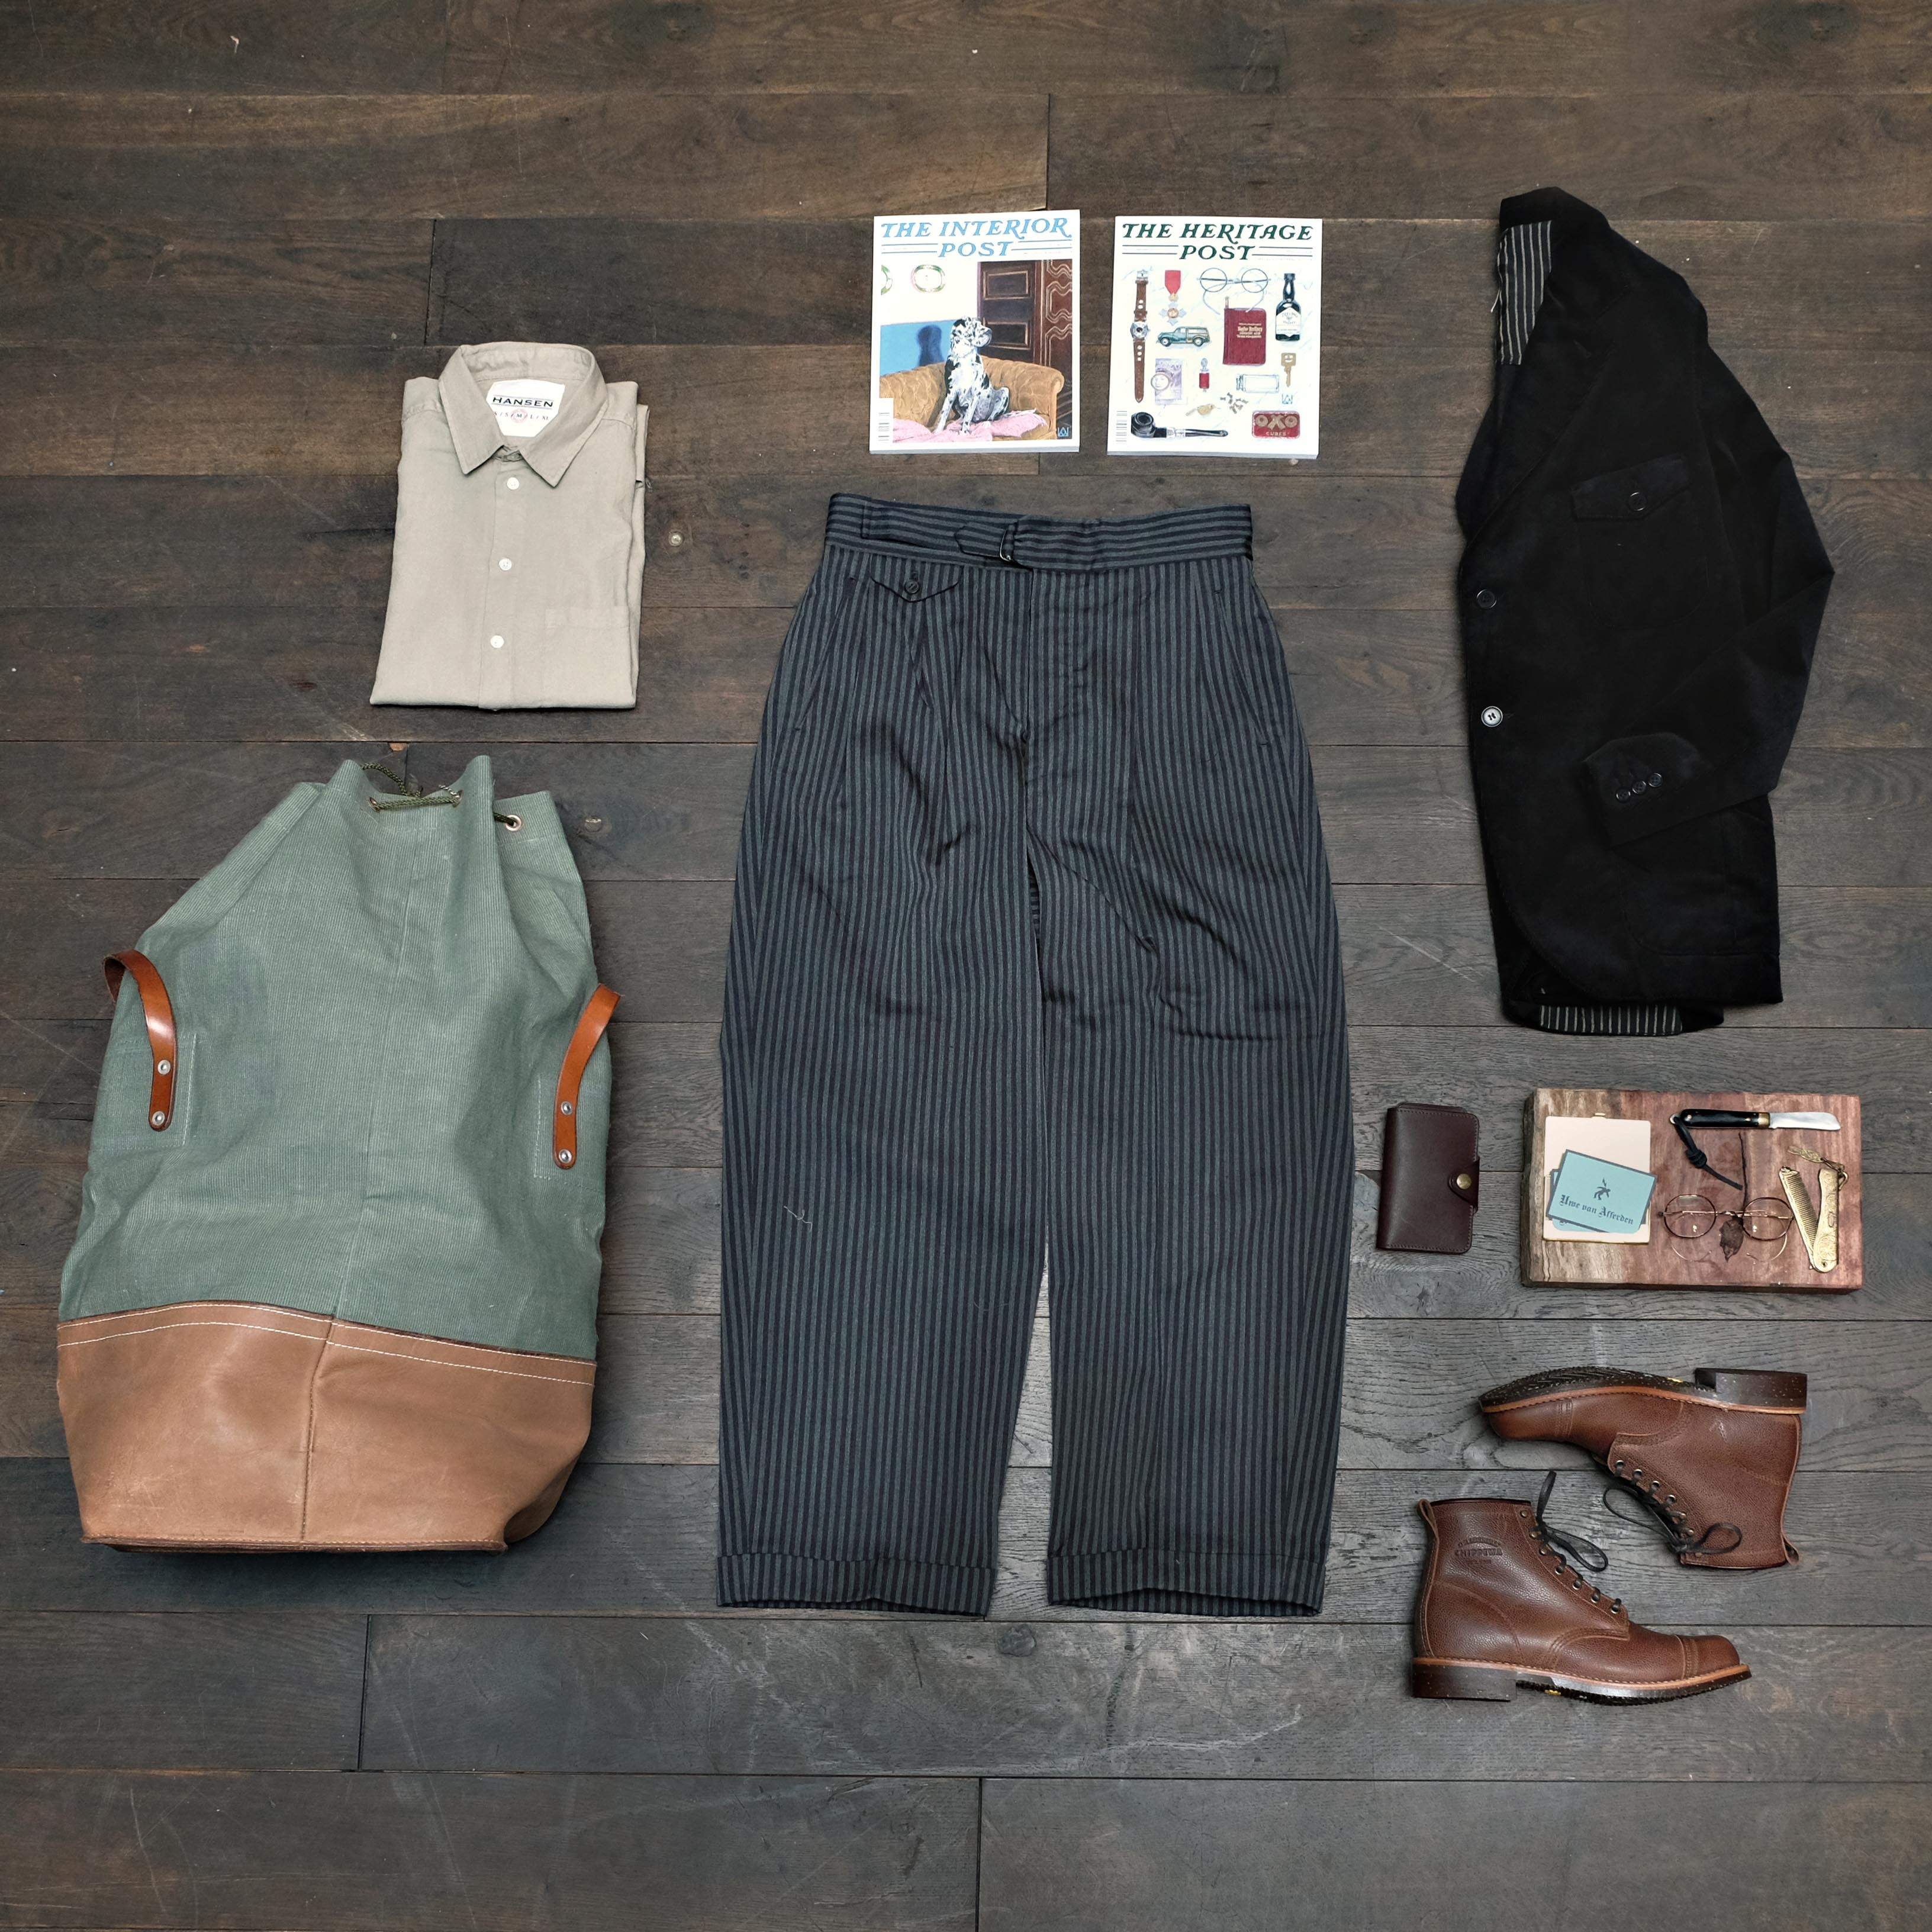 outfit-haversack-chippewa-hansen-interbrigade-heritagepost-rinouma-gouverneuraudigier-blacksign